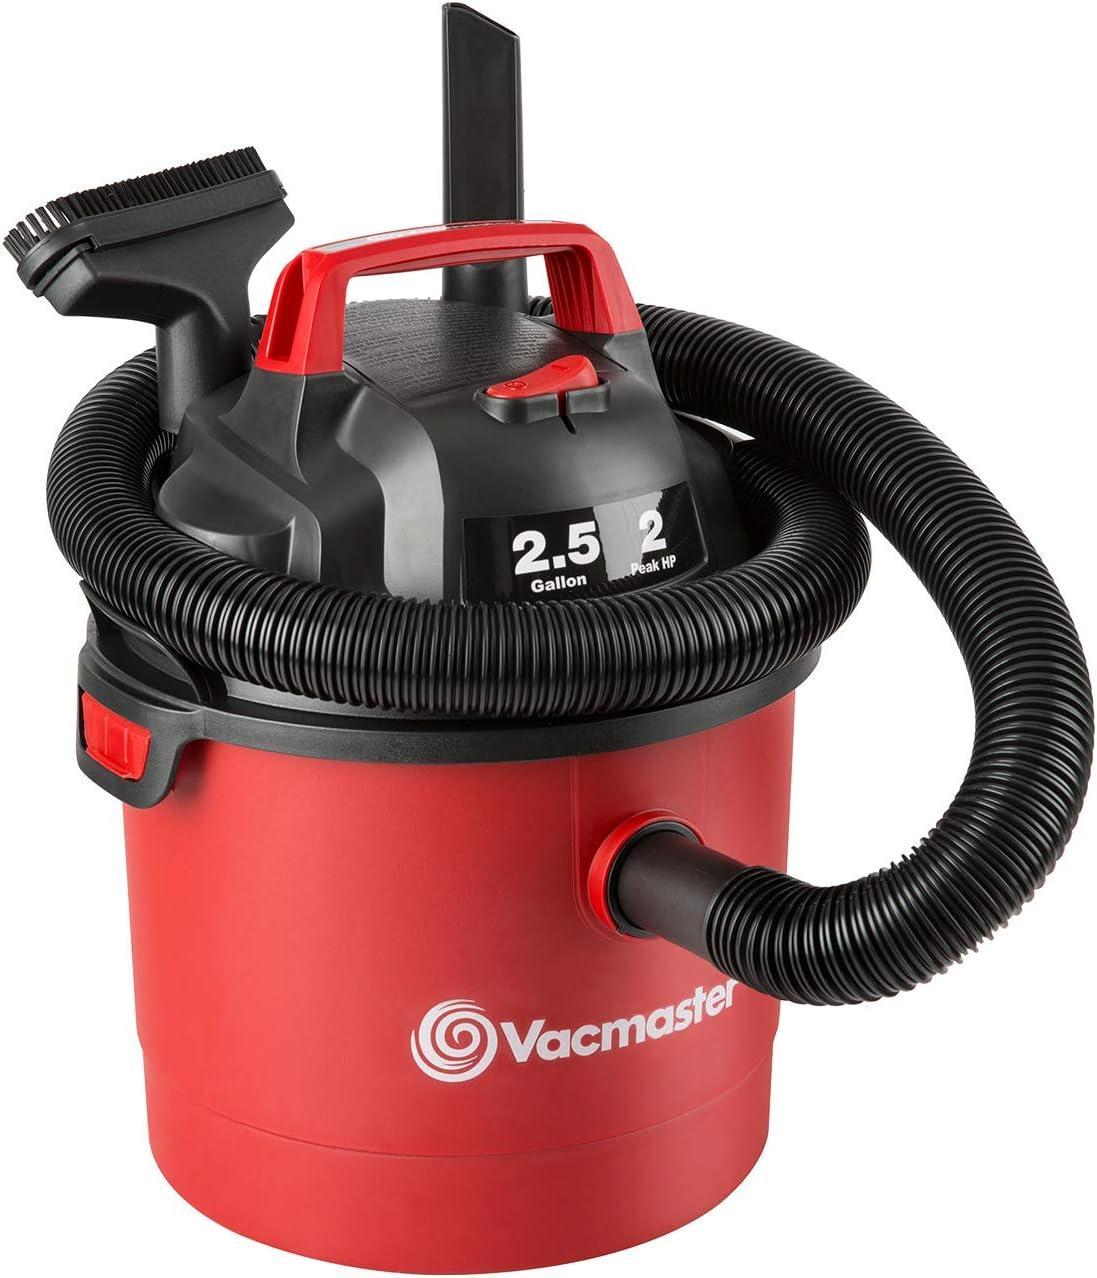 Vacmaster Red Edition VOM205P 1101 Portable Wet Dry Shop Vacuum 2.5 Gallon 2 Peak HP 1-1/4 inch Hose